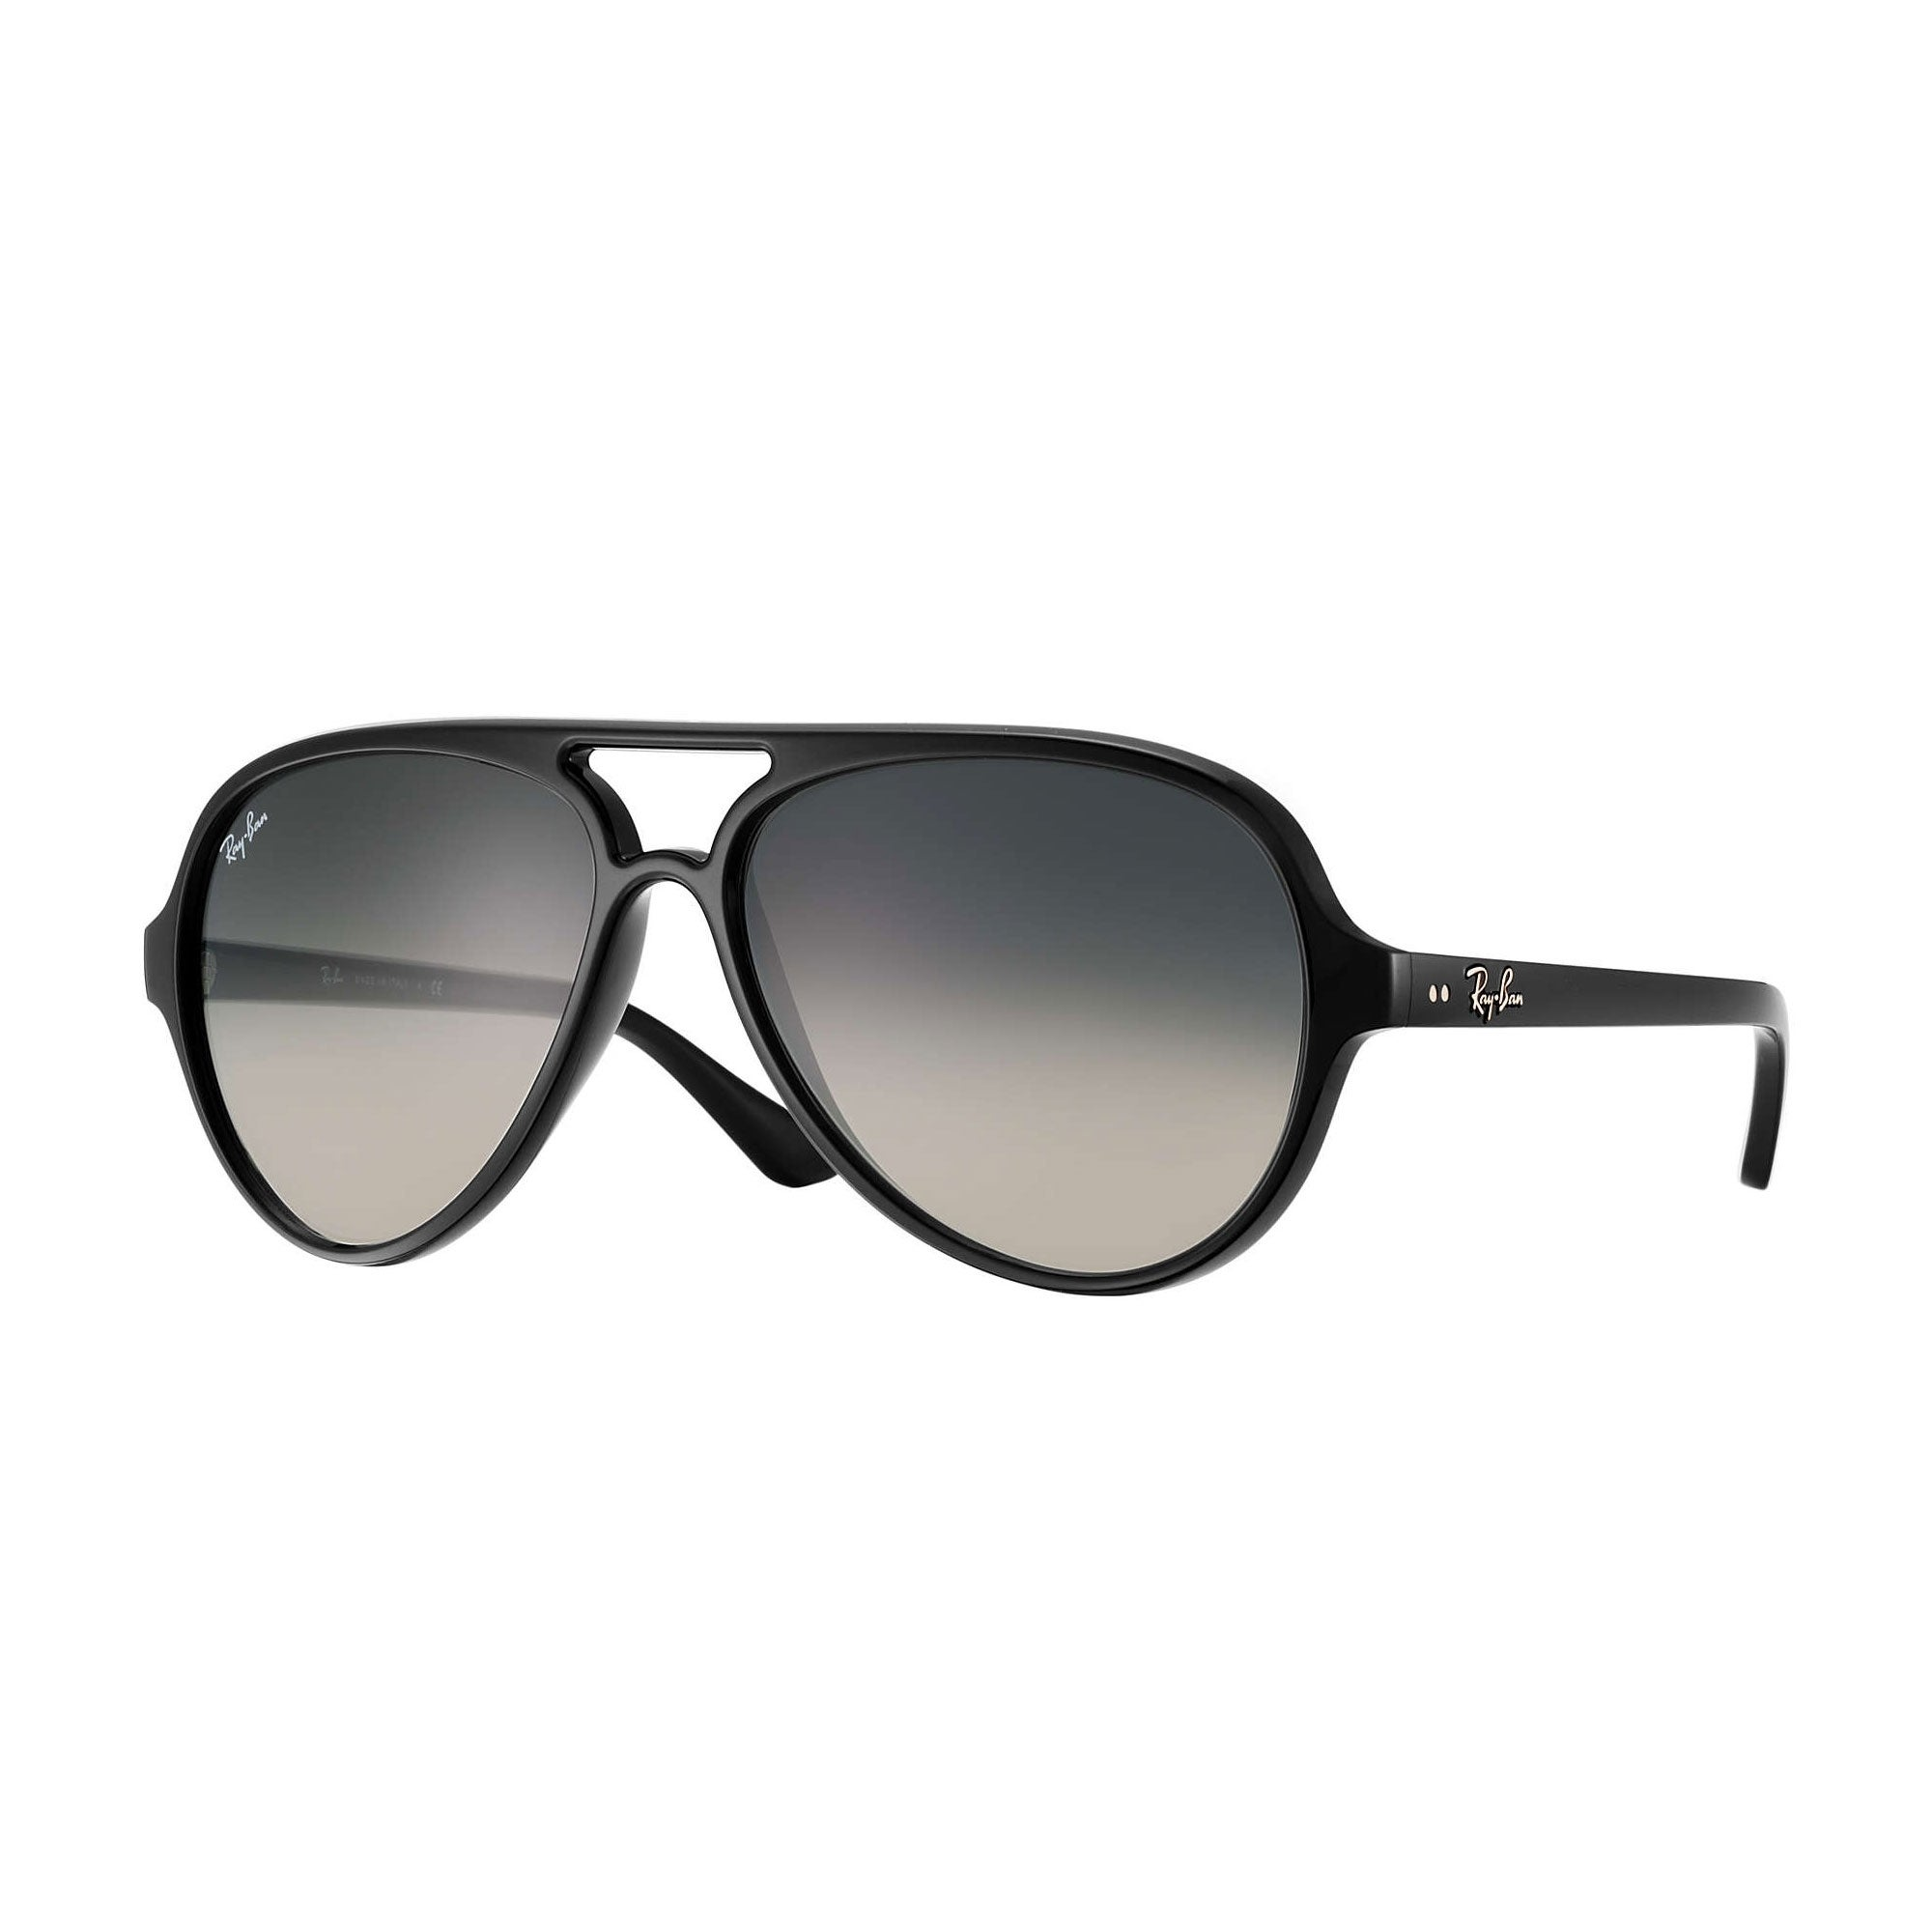 d630e64ff2 Shop Ray-Ban RB4125 Cats 5000 Classic Sunglasses 59mm - Free ...